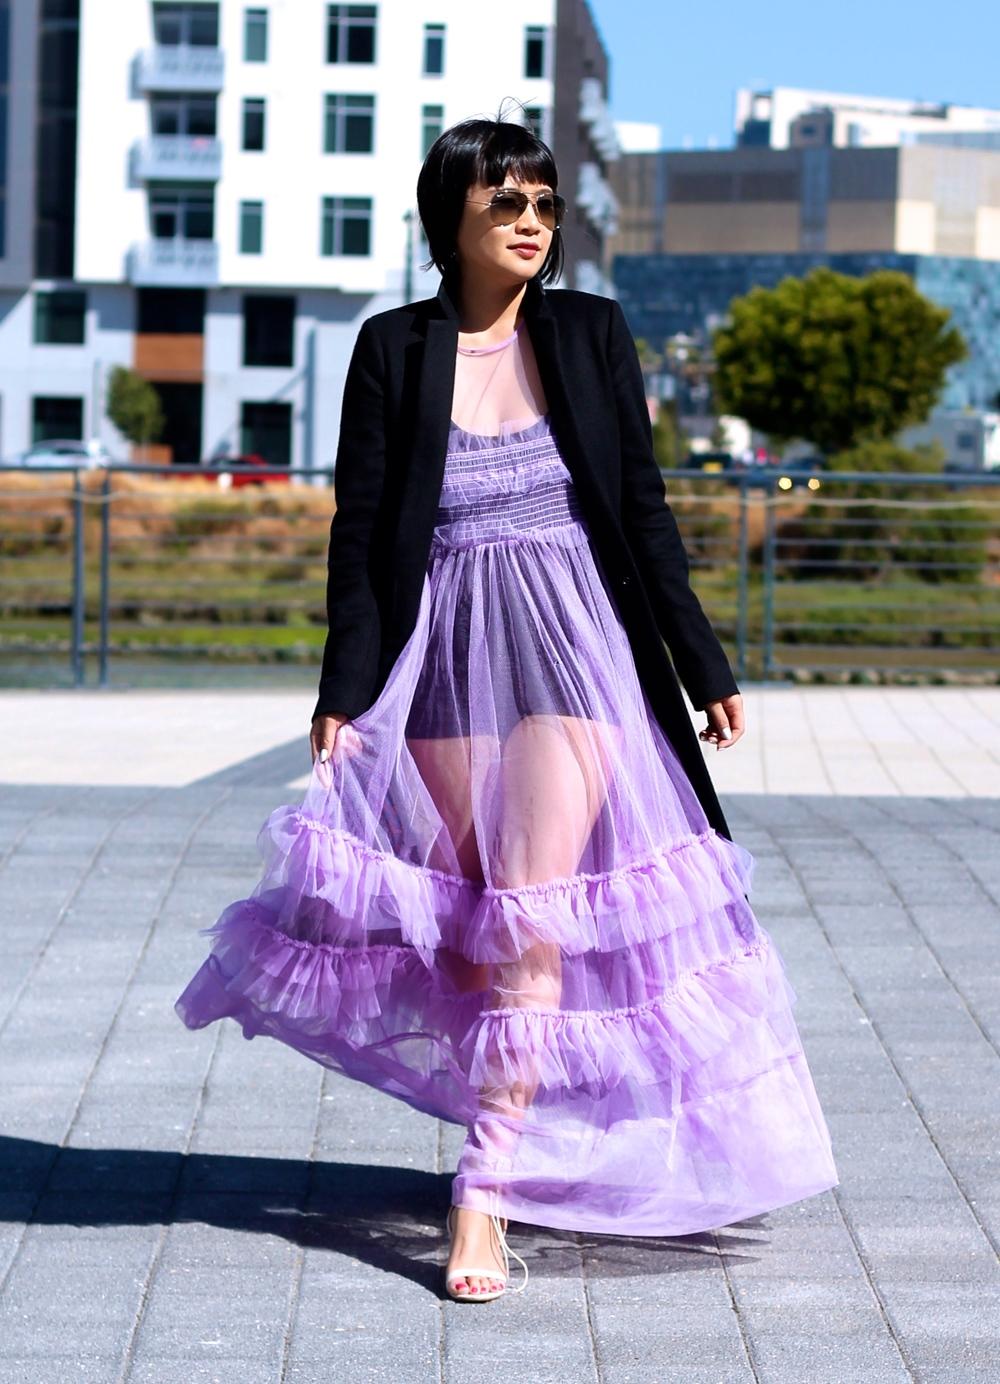 Nasty Gal dress, All Saints jacket, Chinese Laundry shoes, Ray-Ban sunglasses